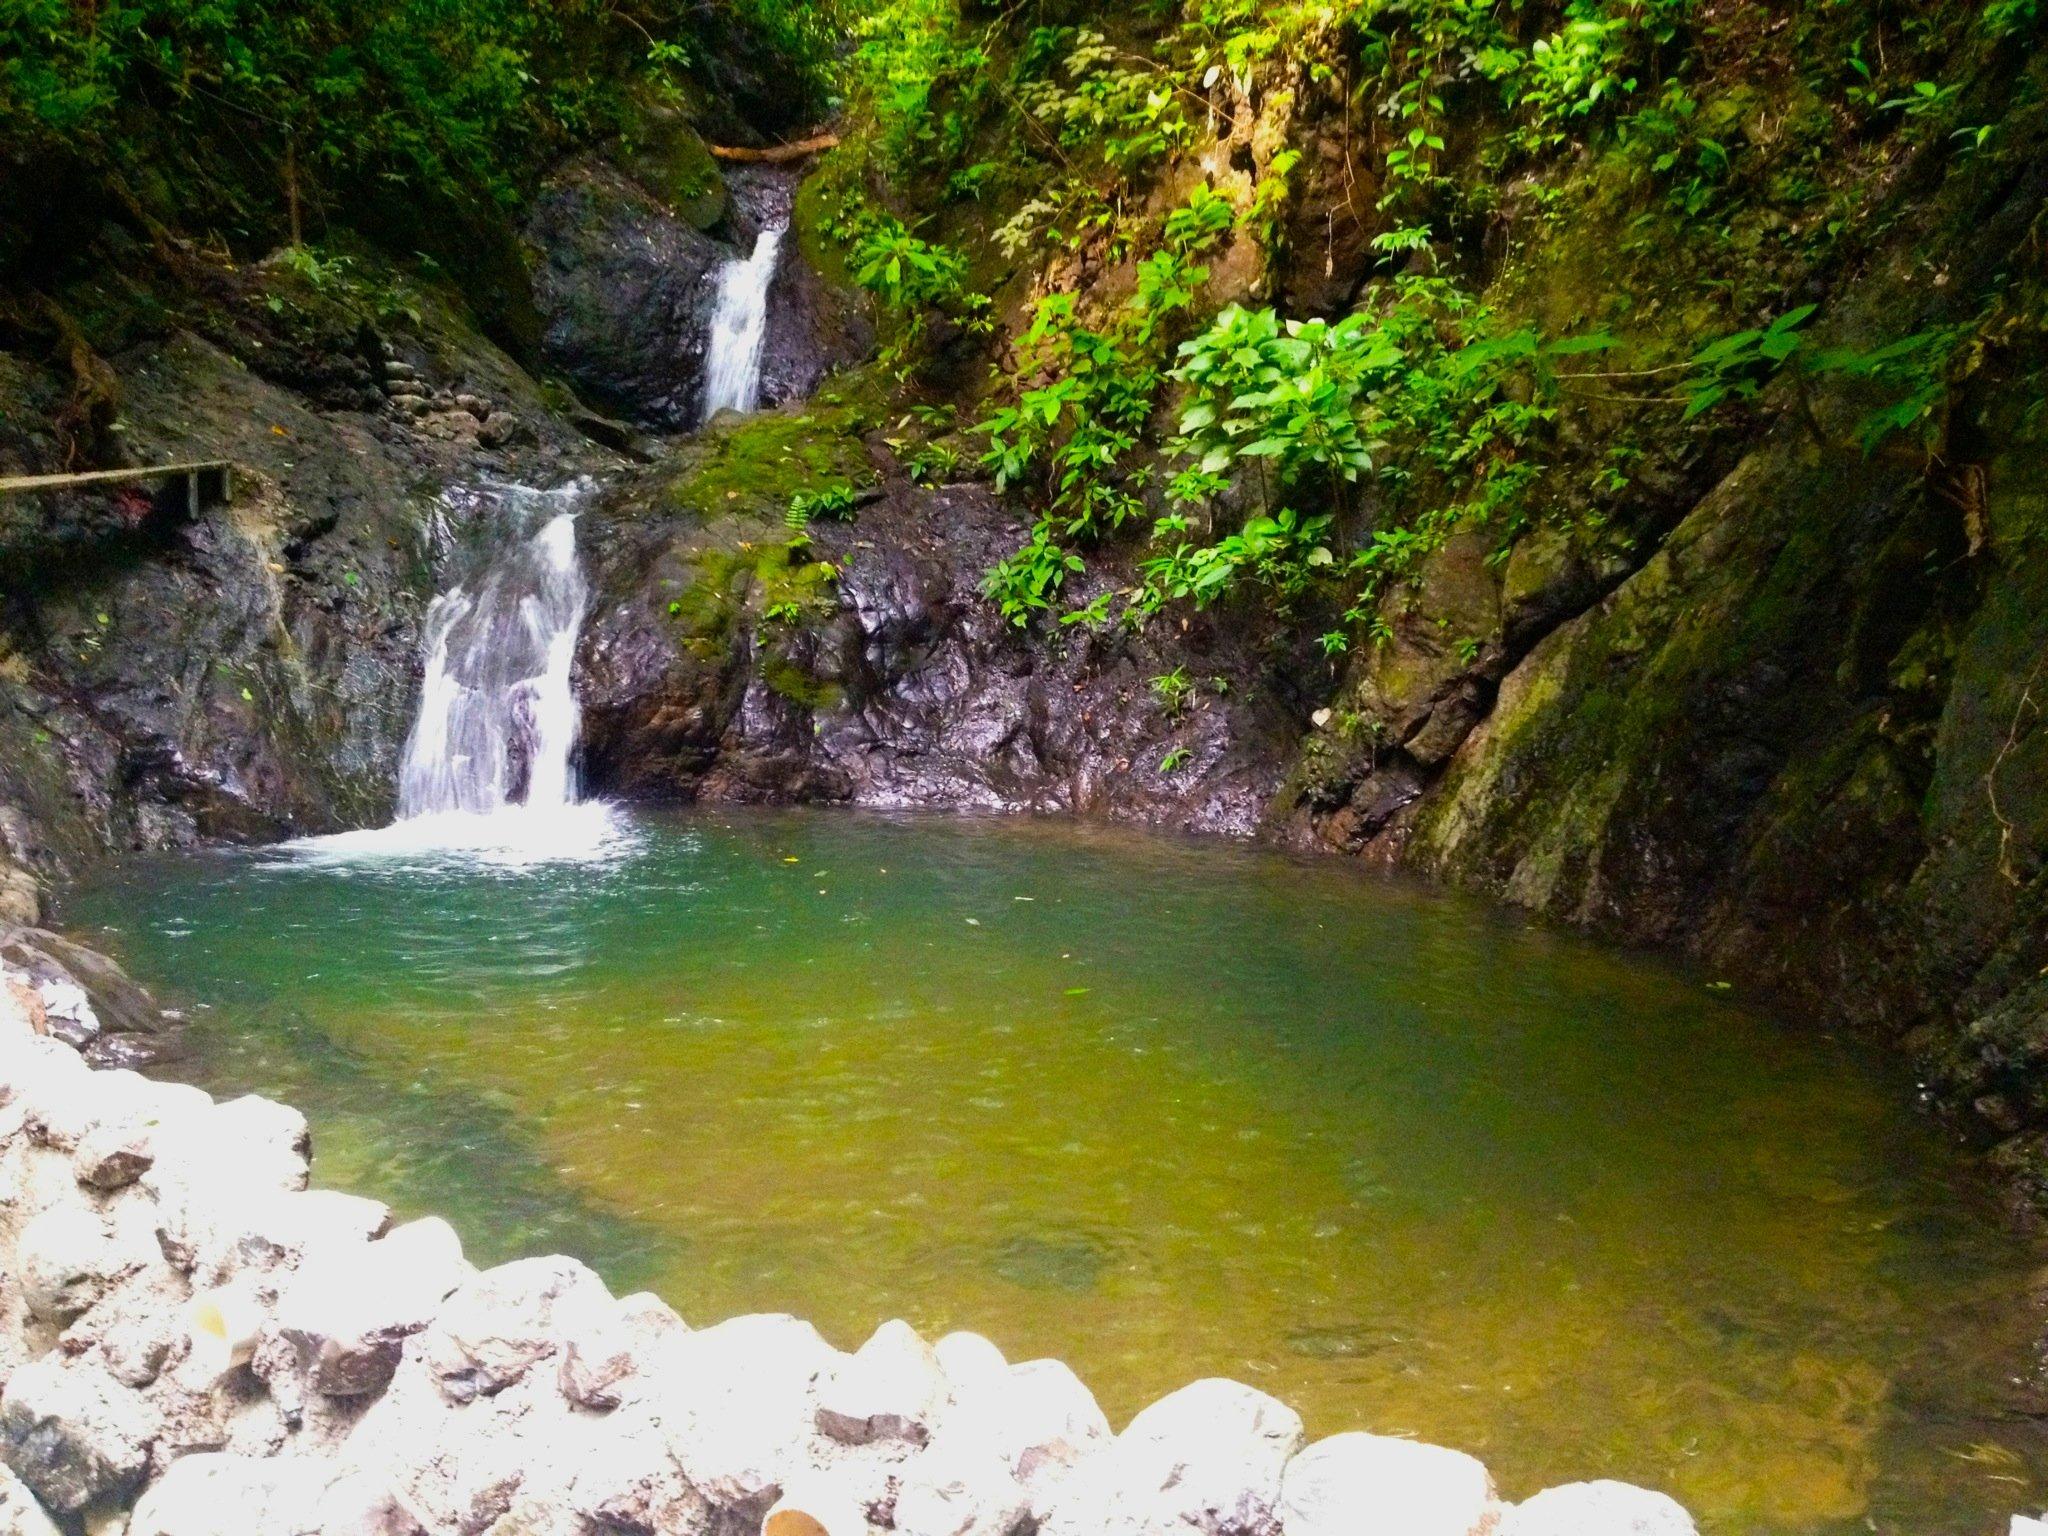 Enjoy Some Natural Pools During The Full Day Adventure At Vista Los Suenos_36